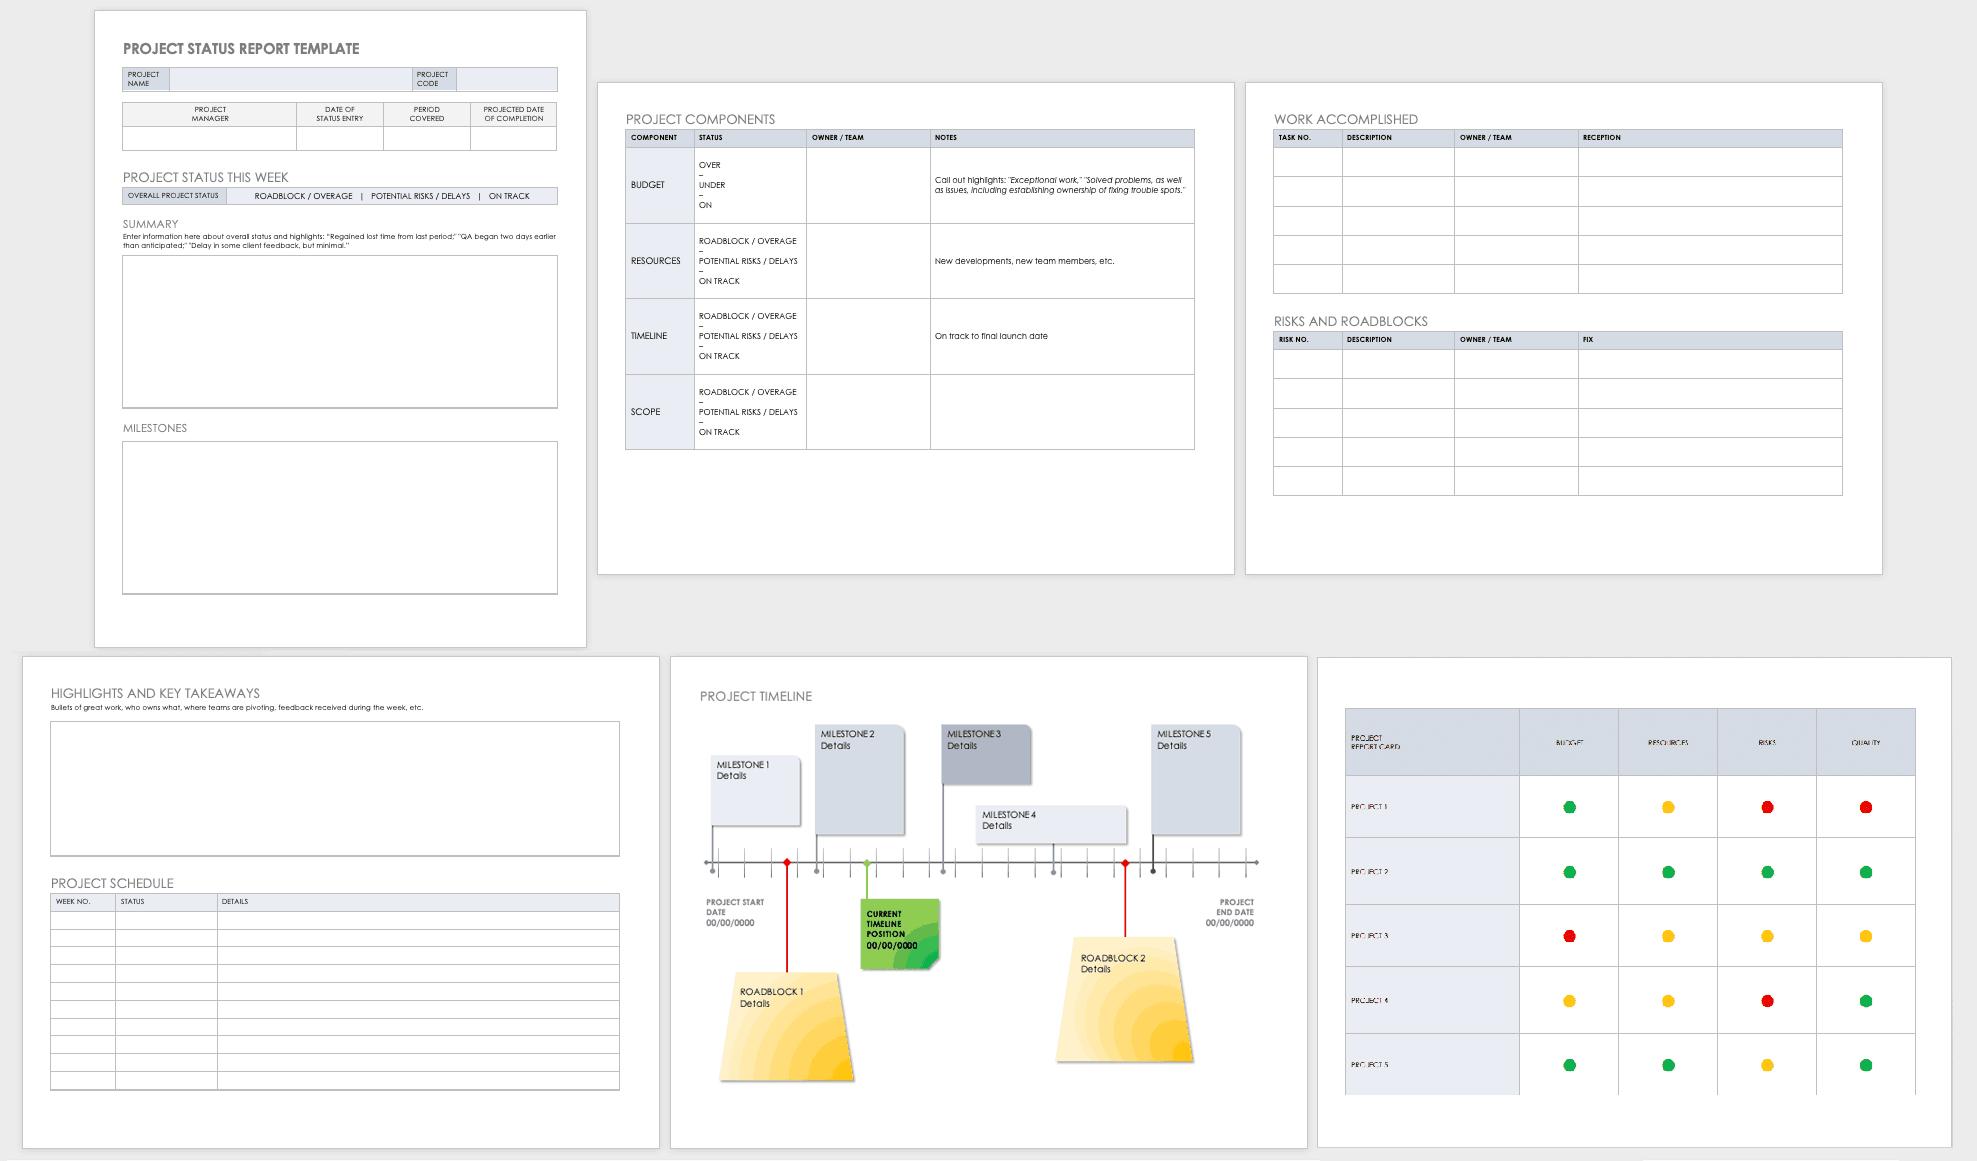 Free Project Report Templates | Smartsheet Regarding Project Implementation Report Template